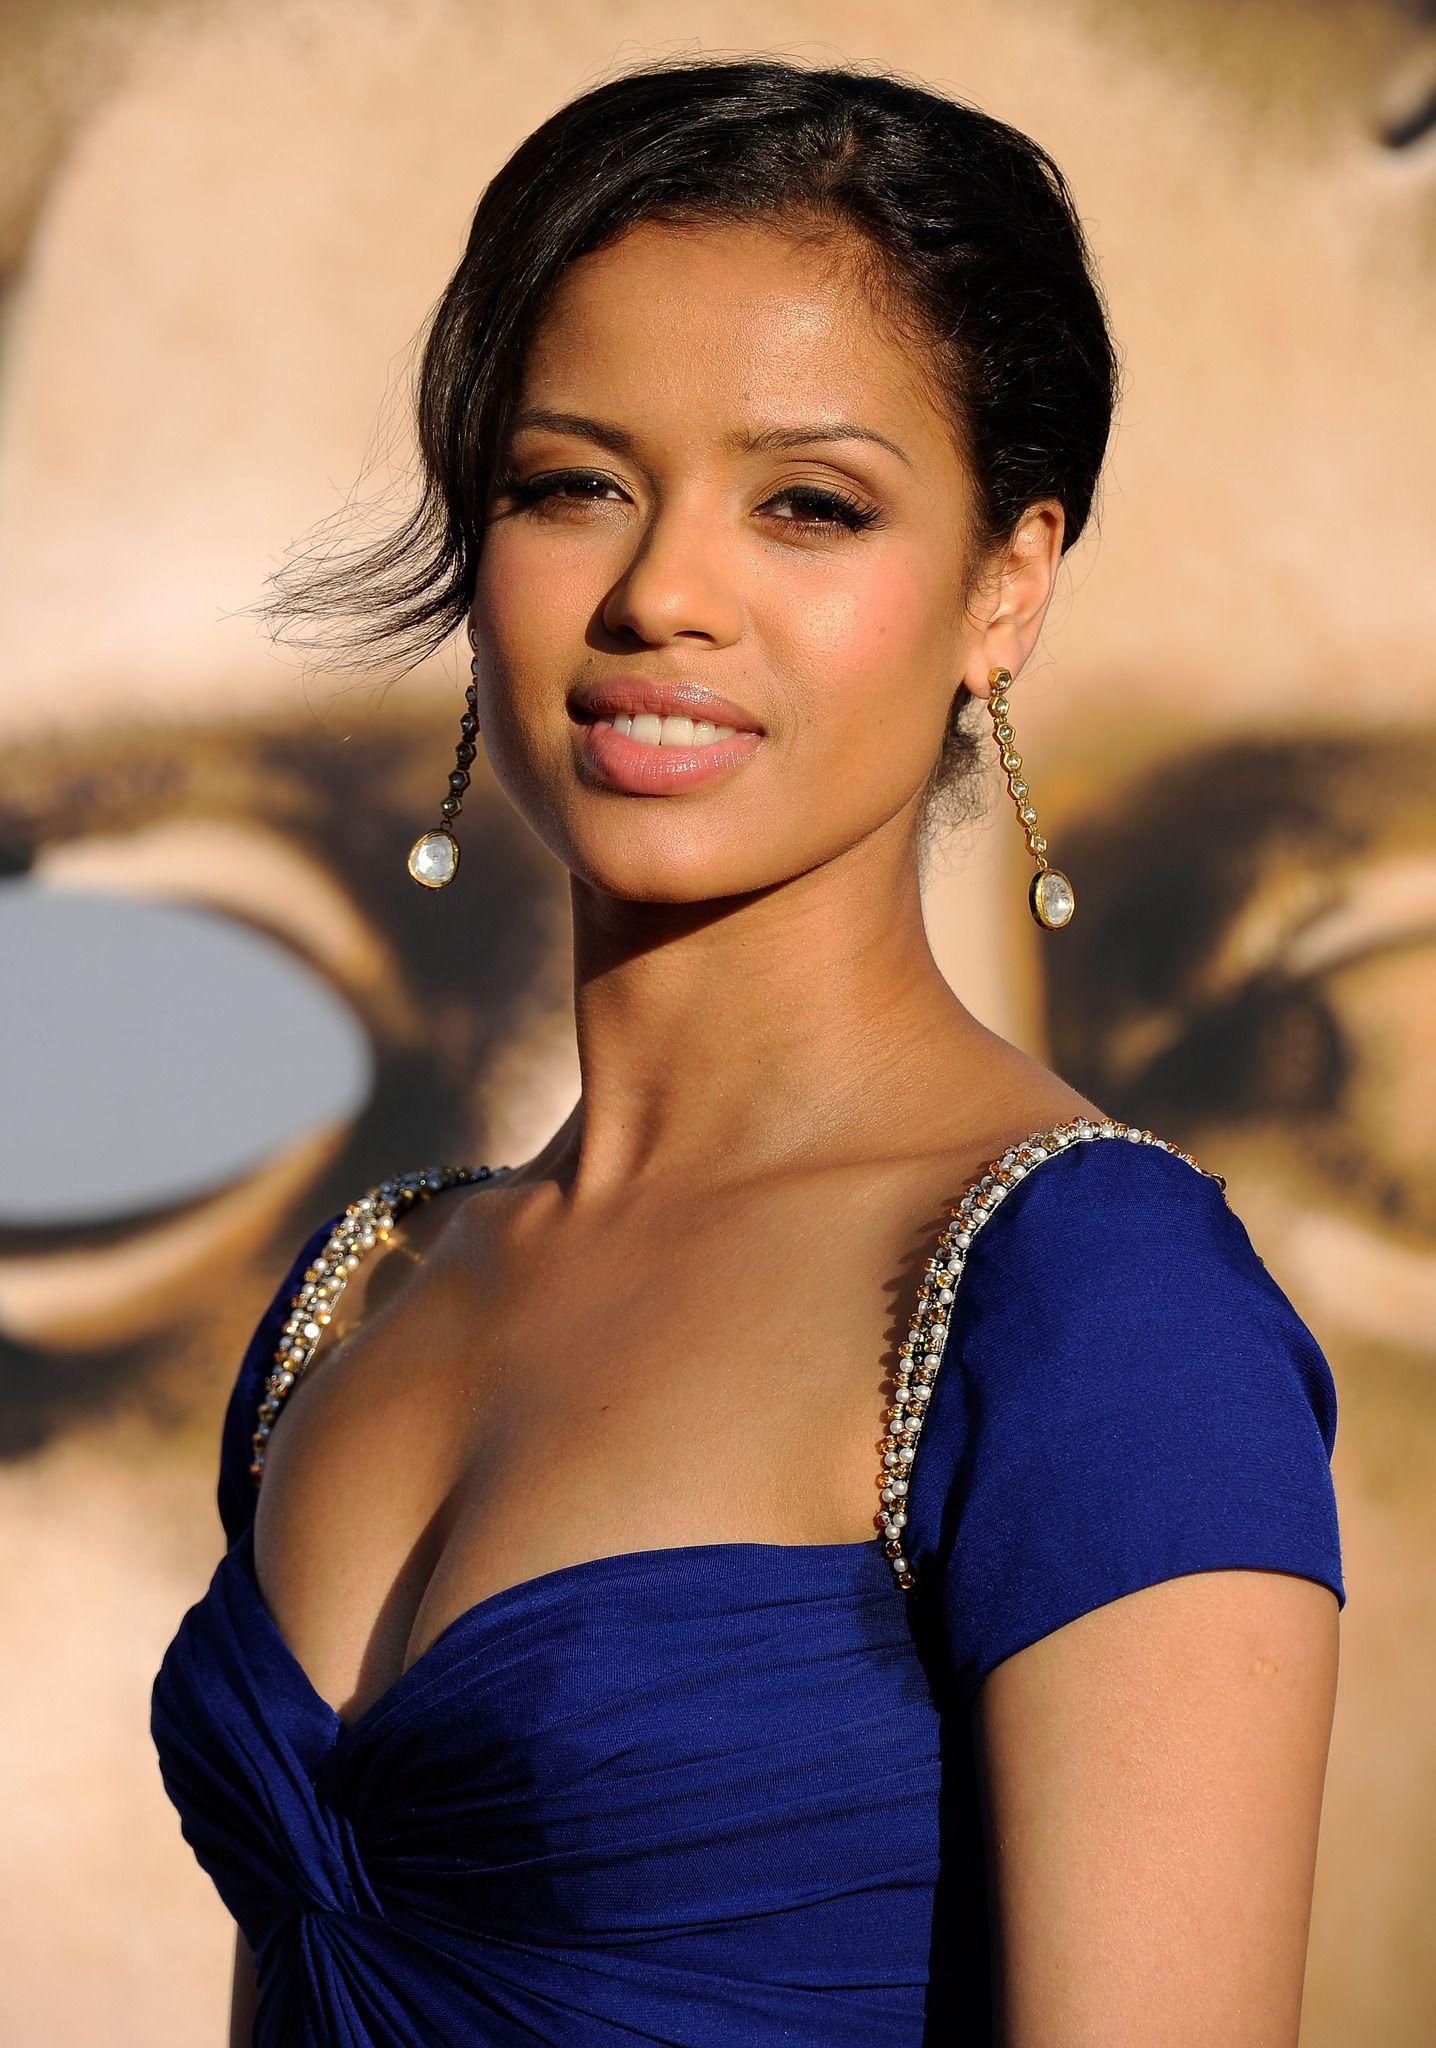 Top 25 Most Attractive Black Actresses - IMDb | Biracial